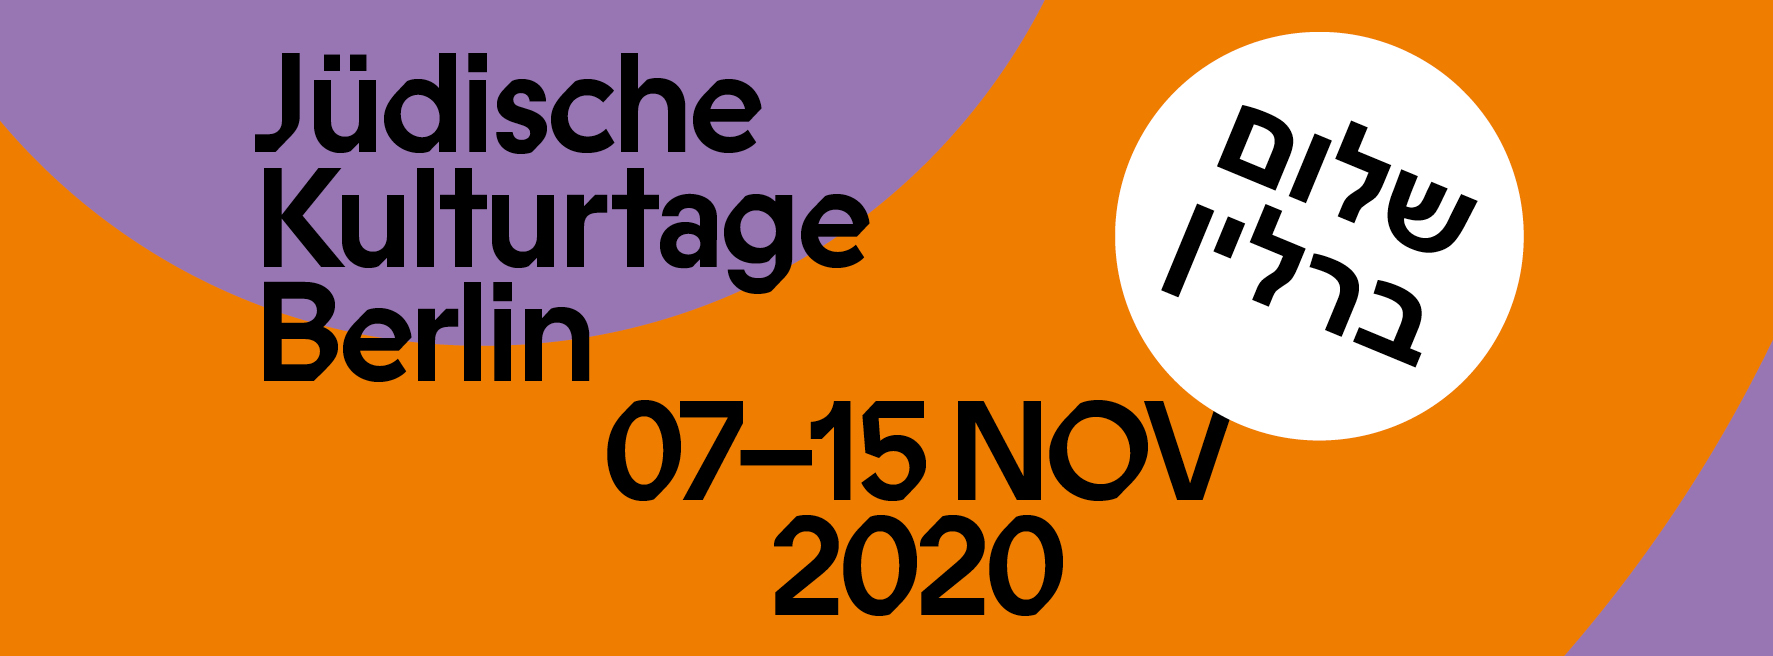 Jüdische Kulturtage Berlin 2020